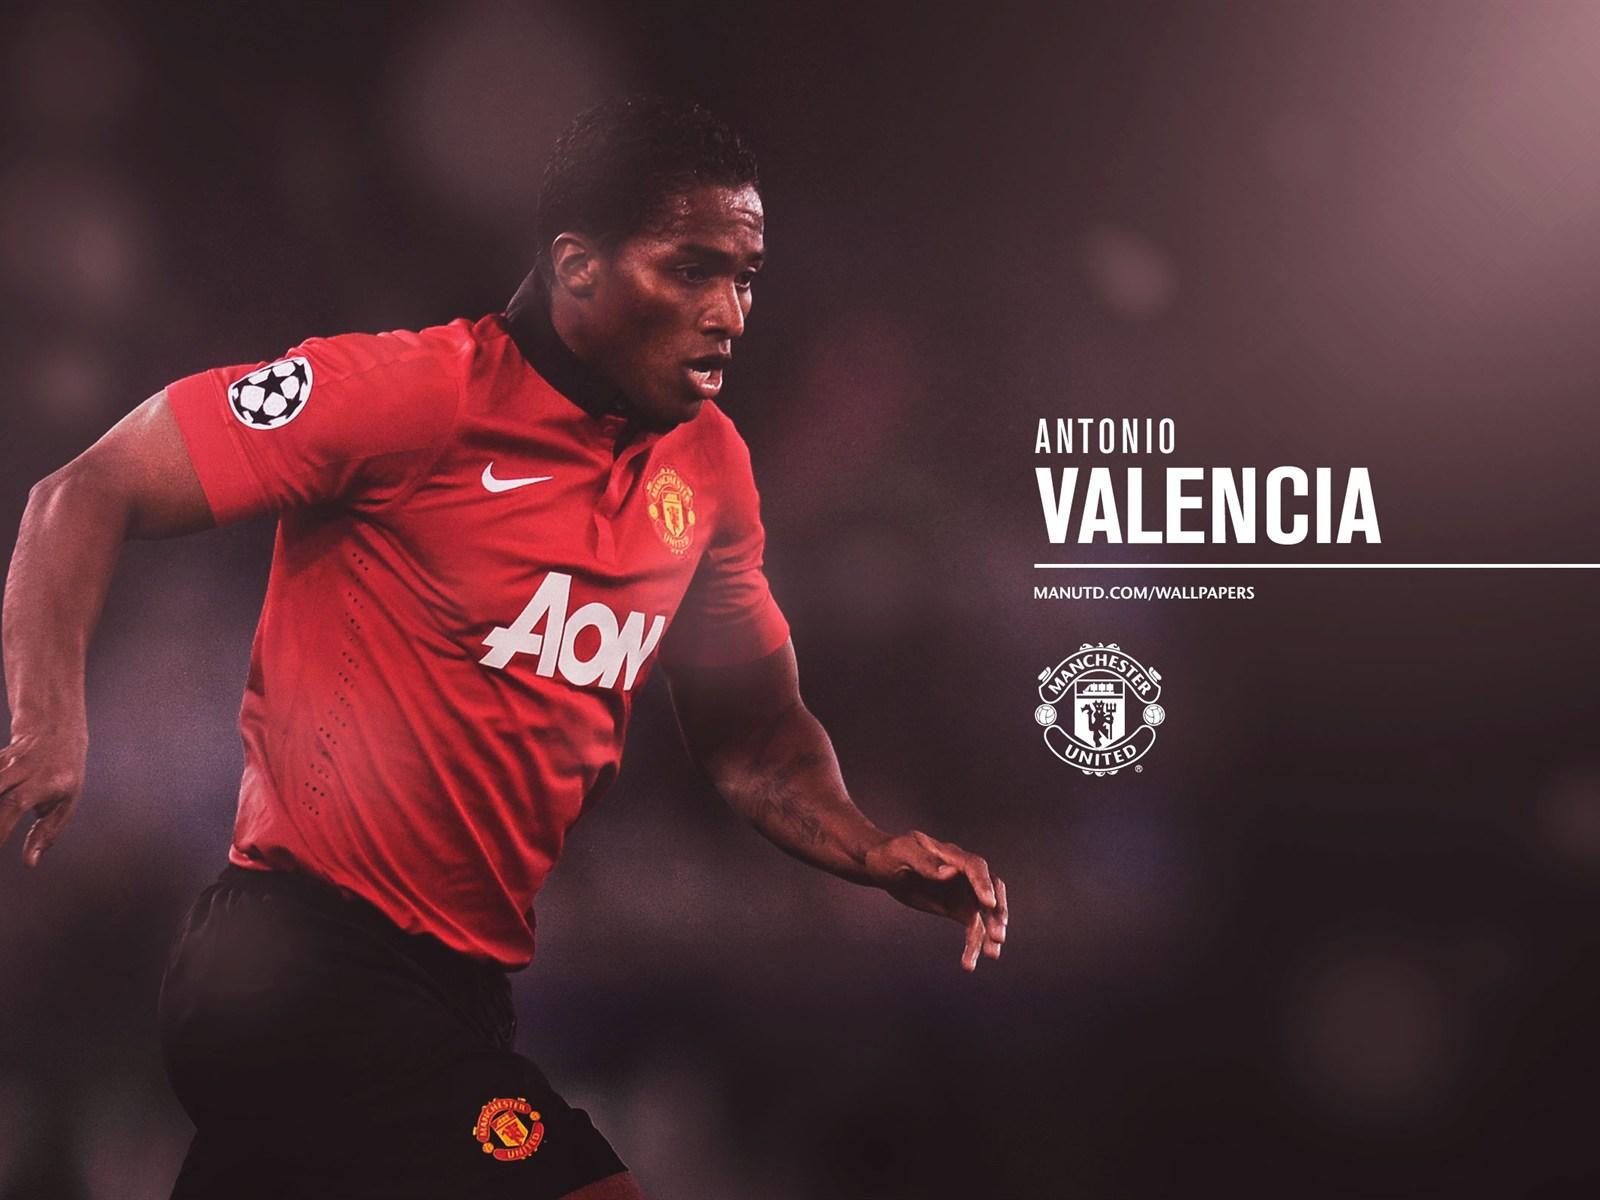 Antonio Valencia